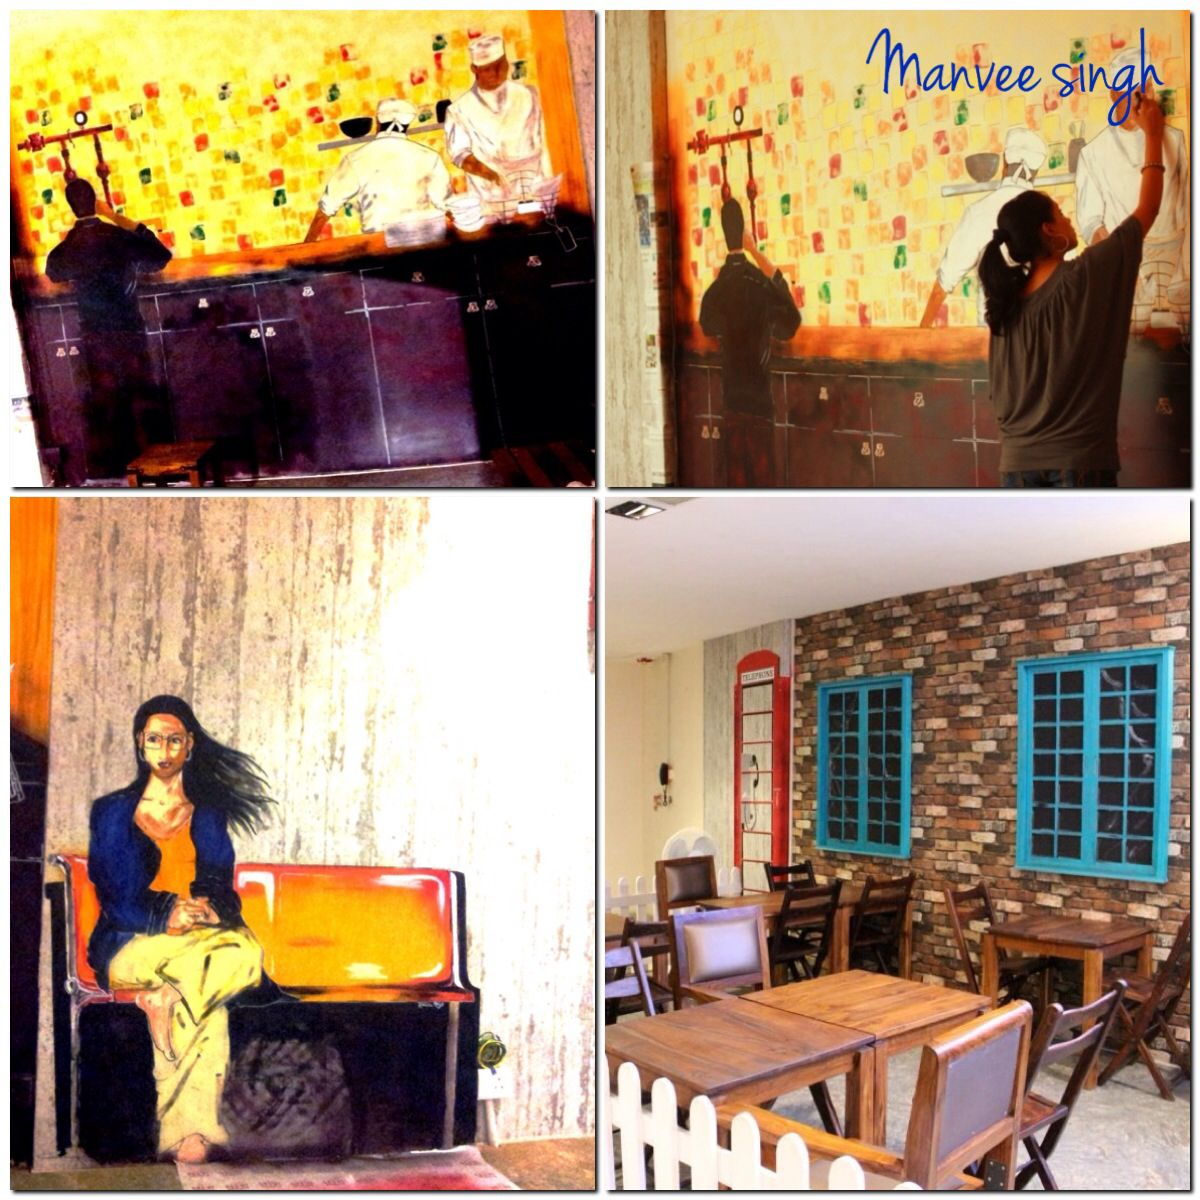 Wall art cafe Delhi heights artcraftpaintingsacrylicbohemian